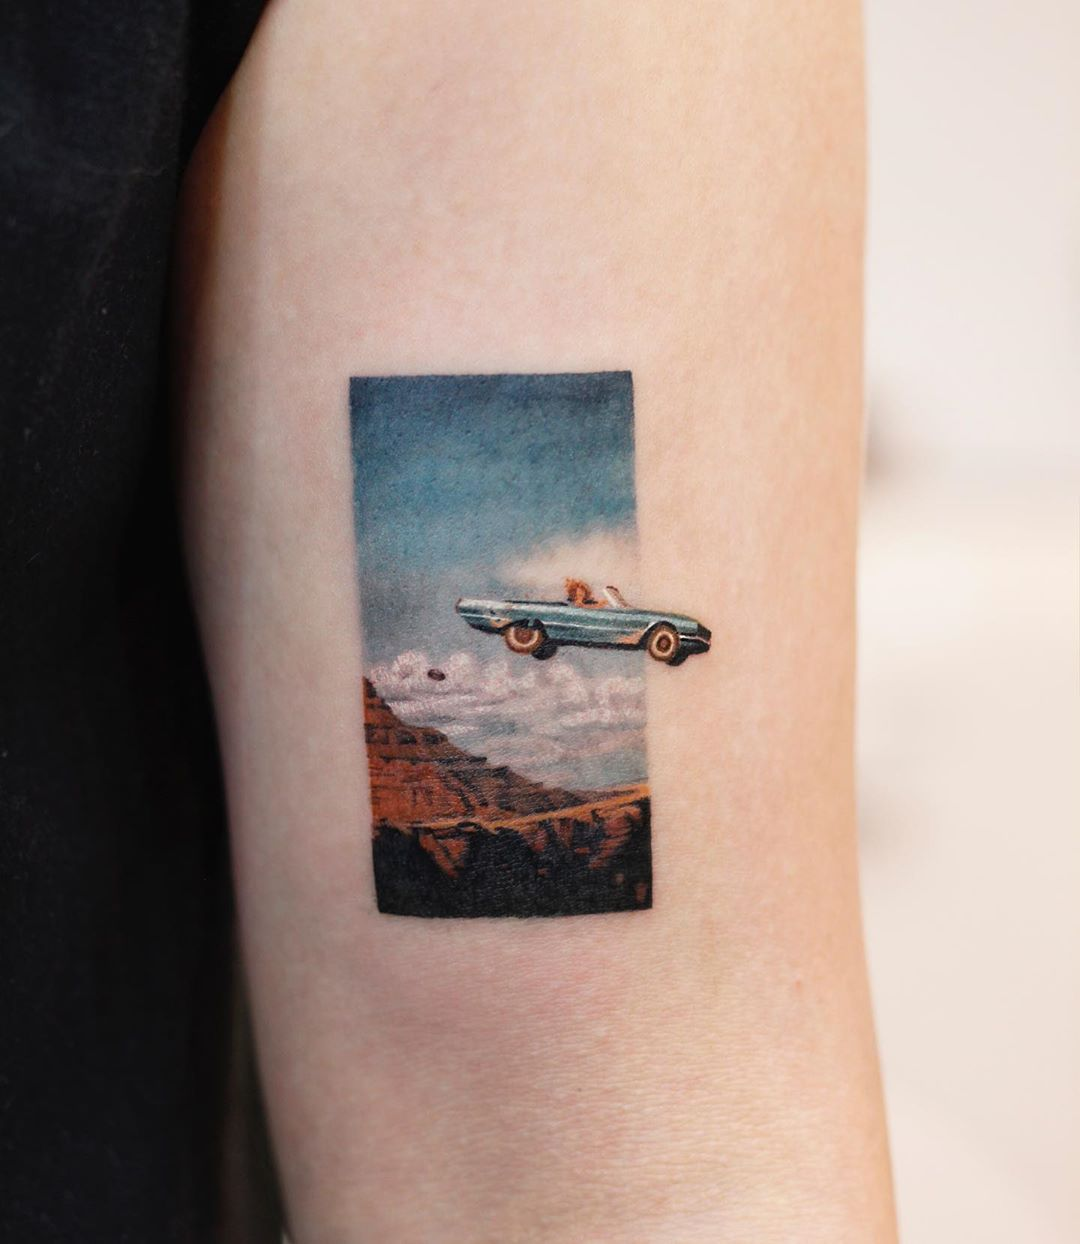 Thelma & Louise by tattooist Saegeem